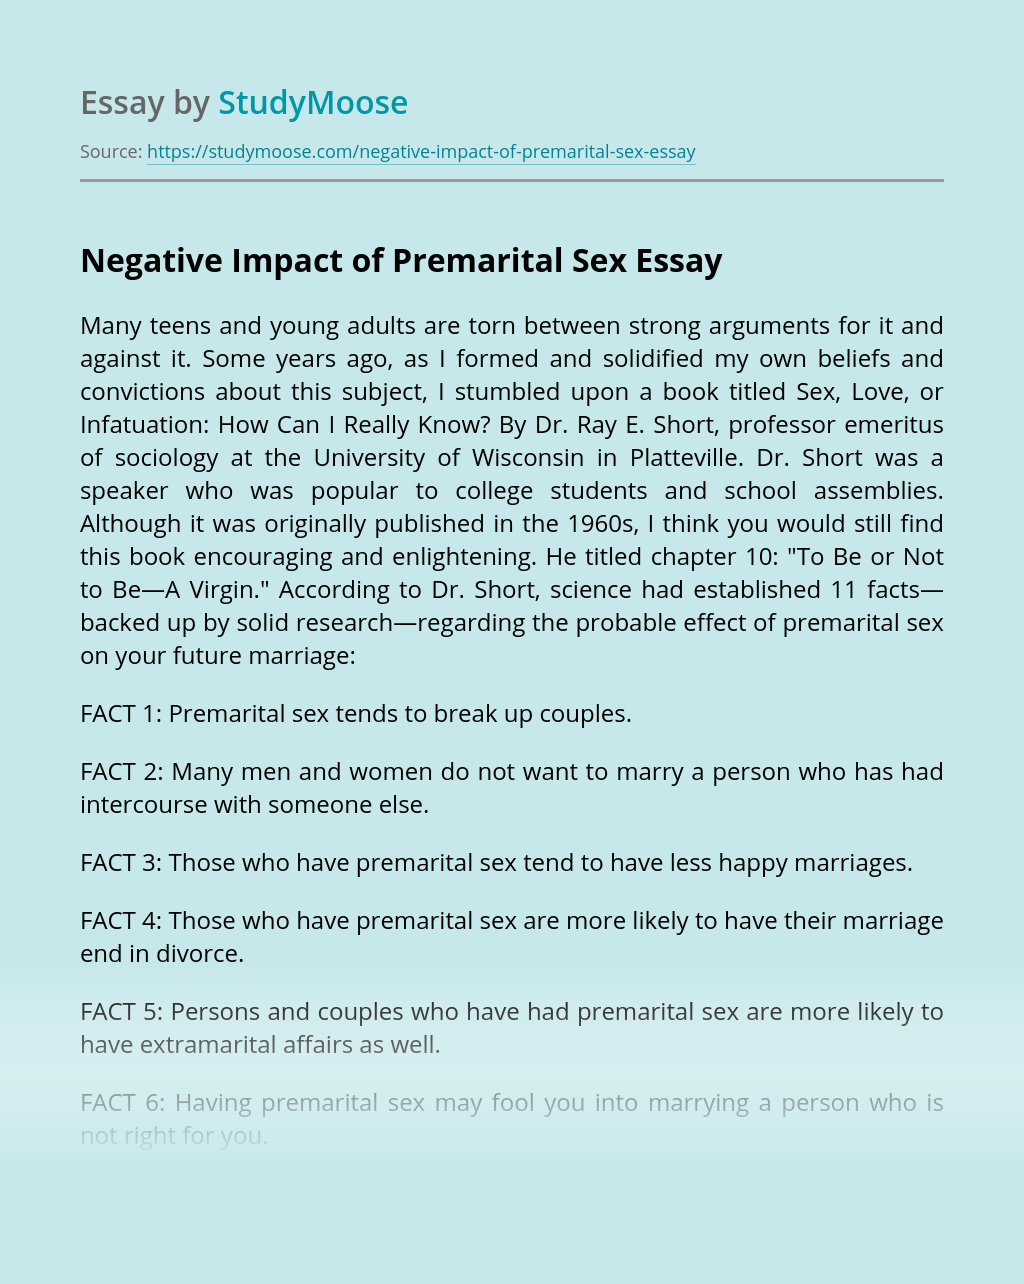 Negative Impact of Premarital Sex